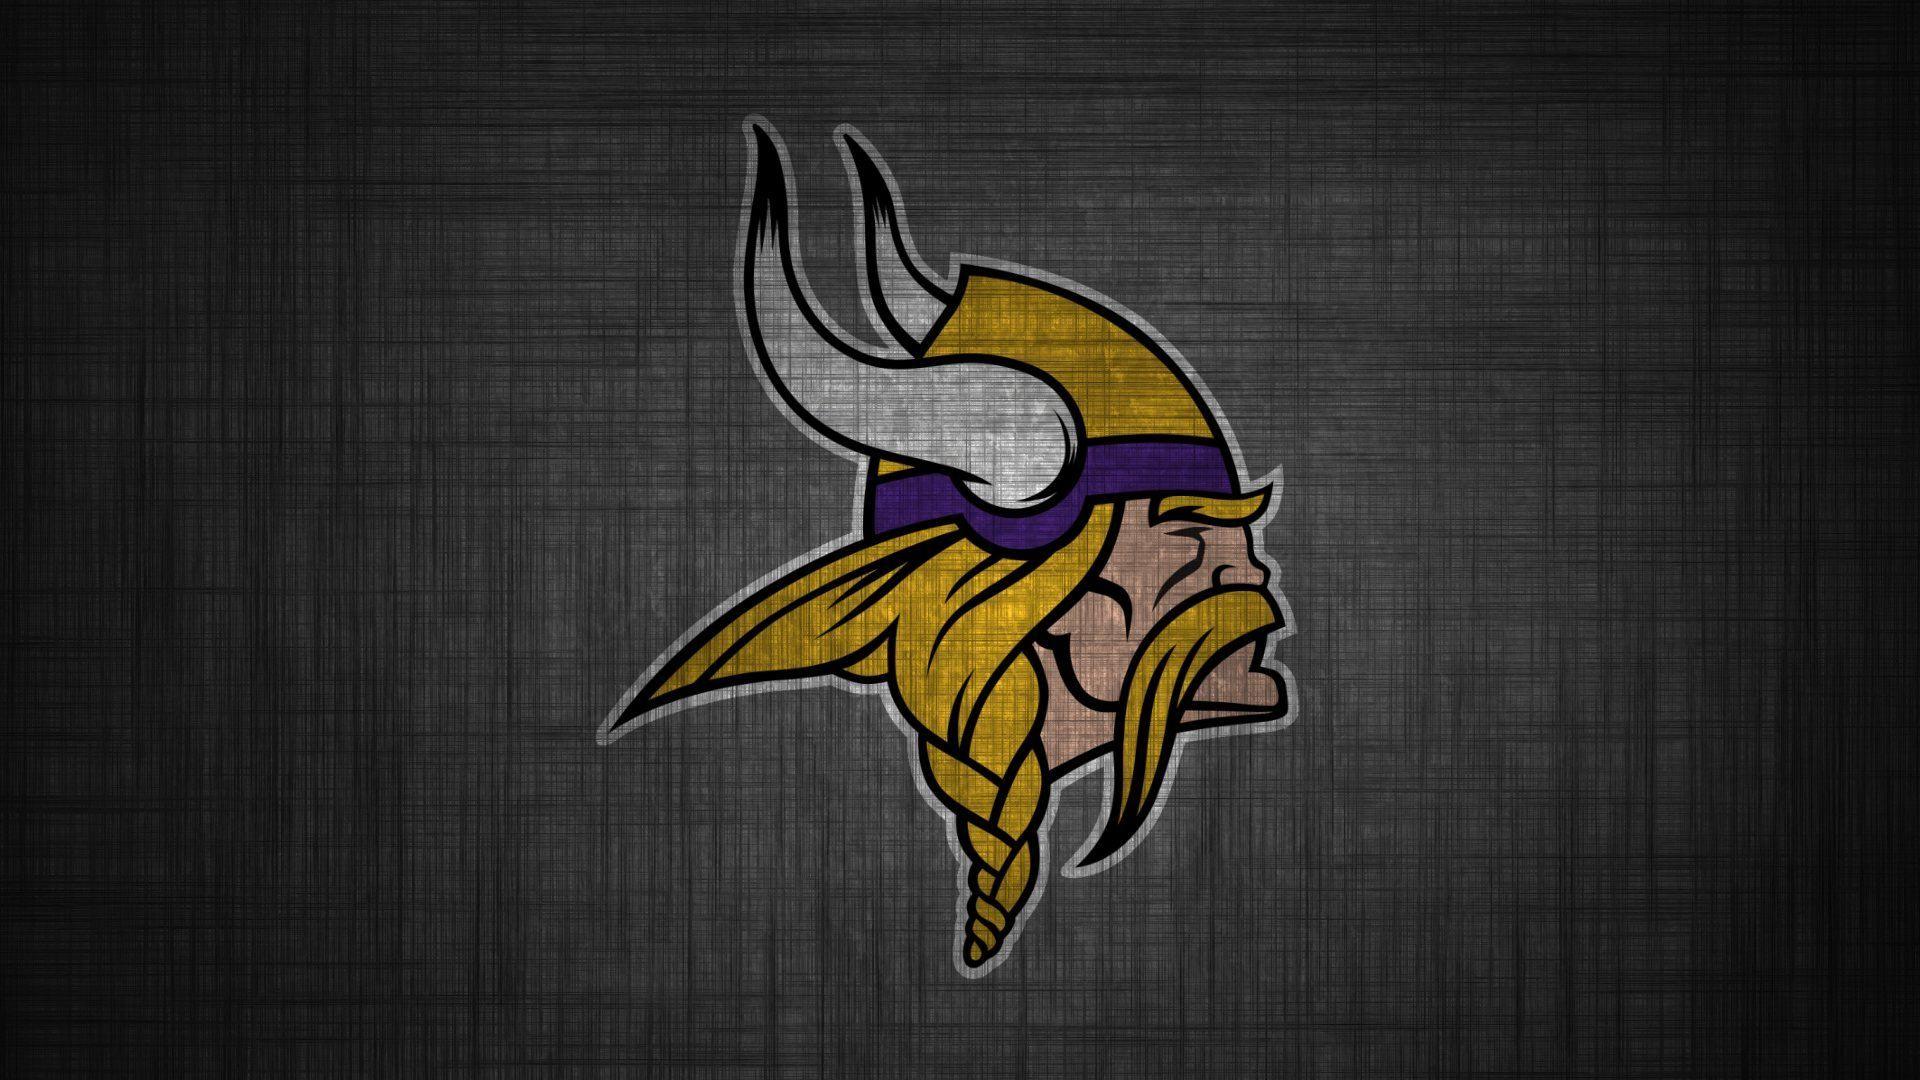 Minnesota Vikings Wallpaper HD